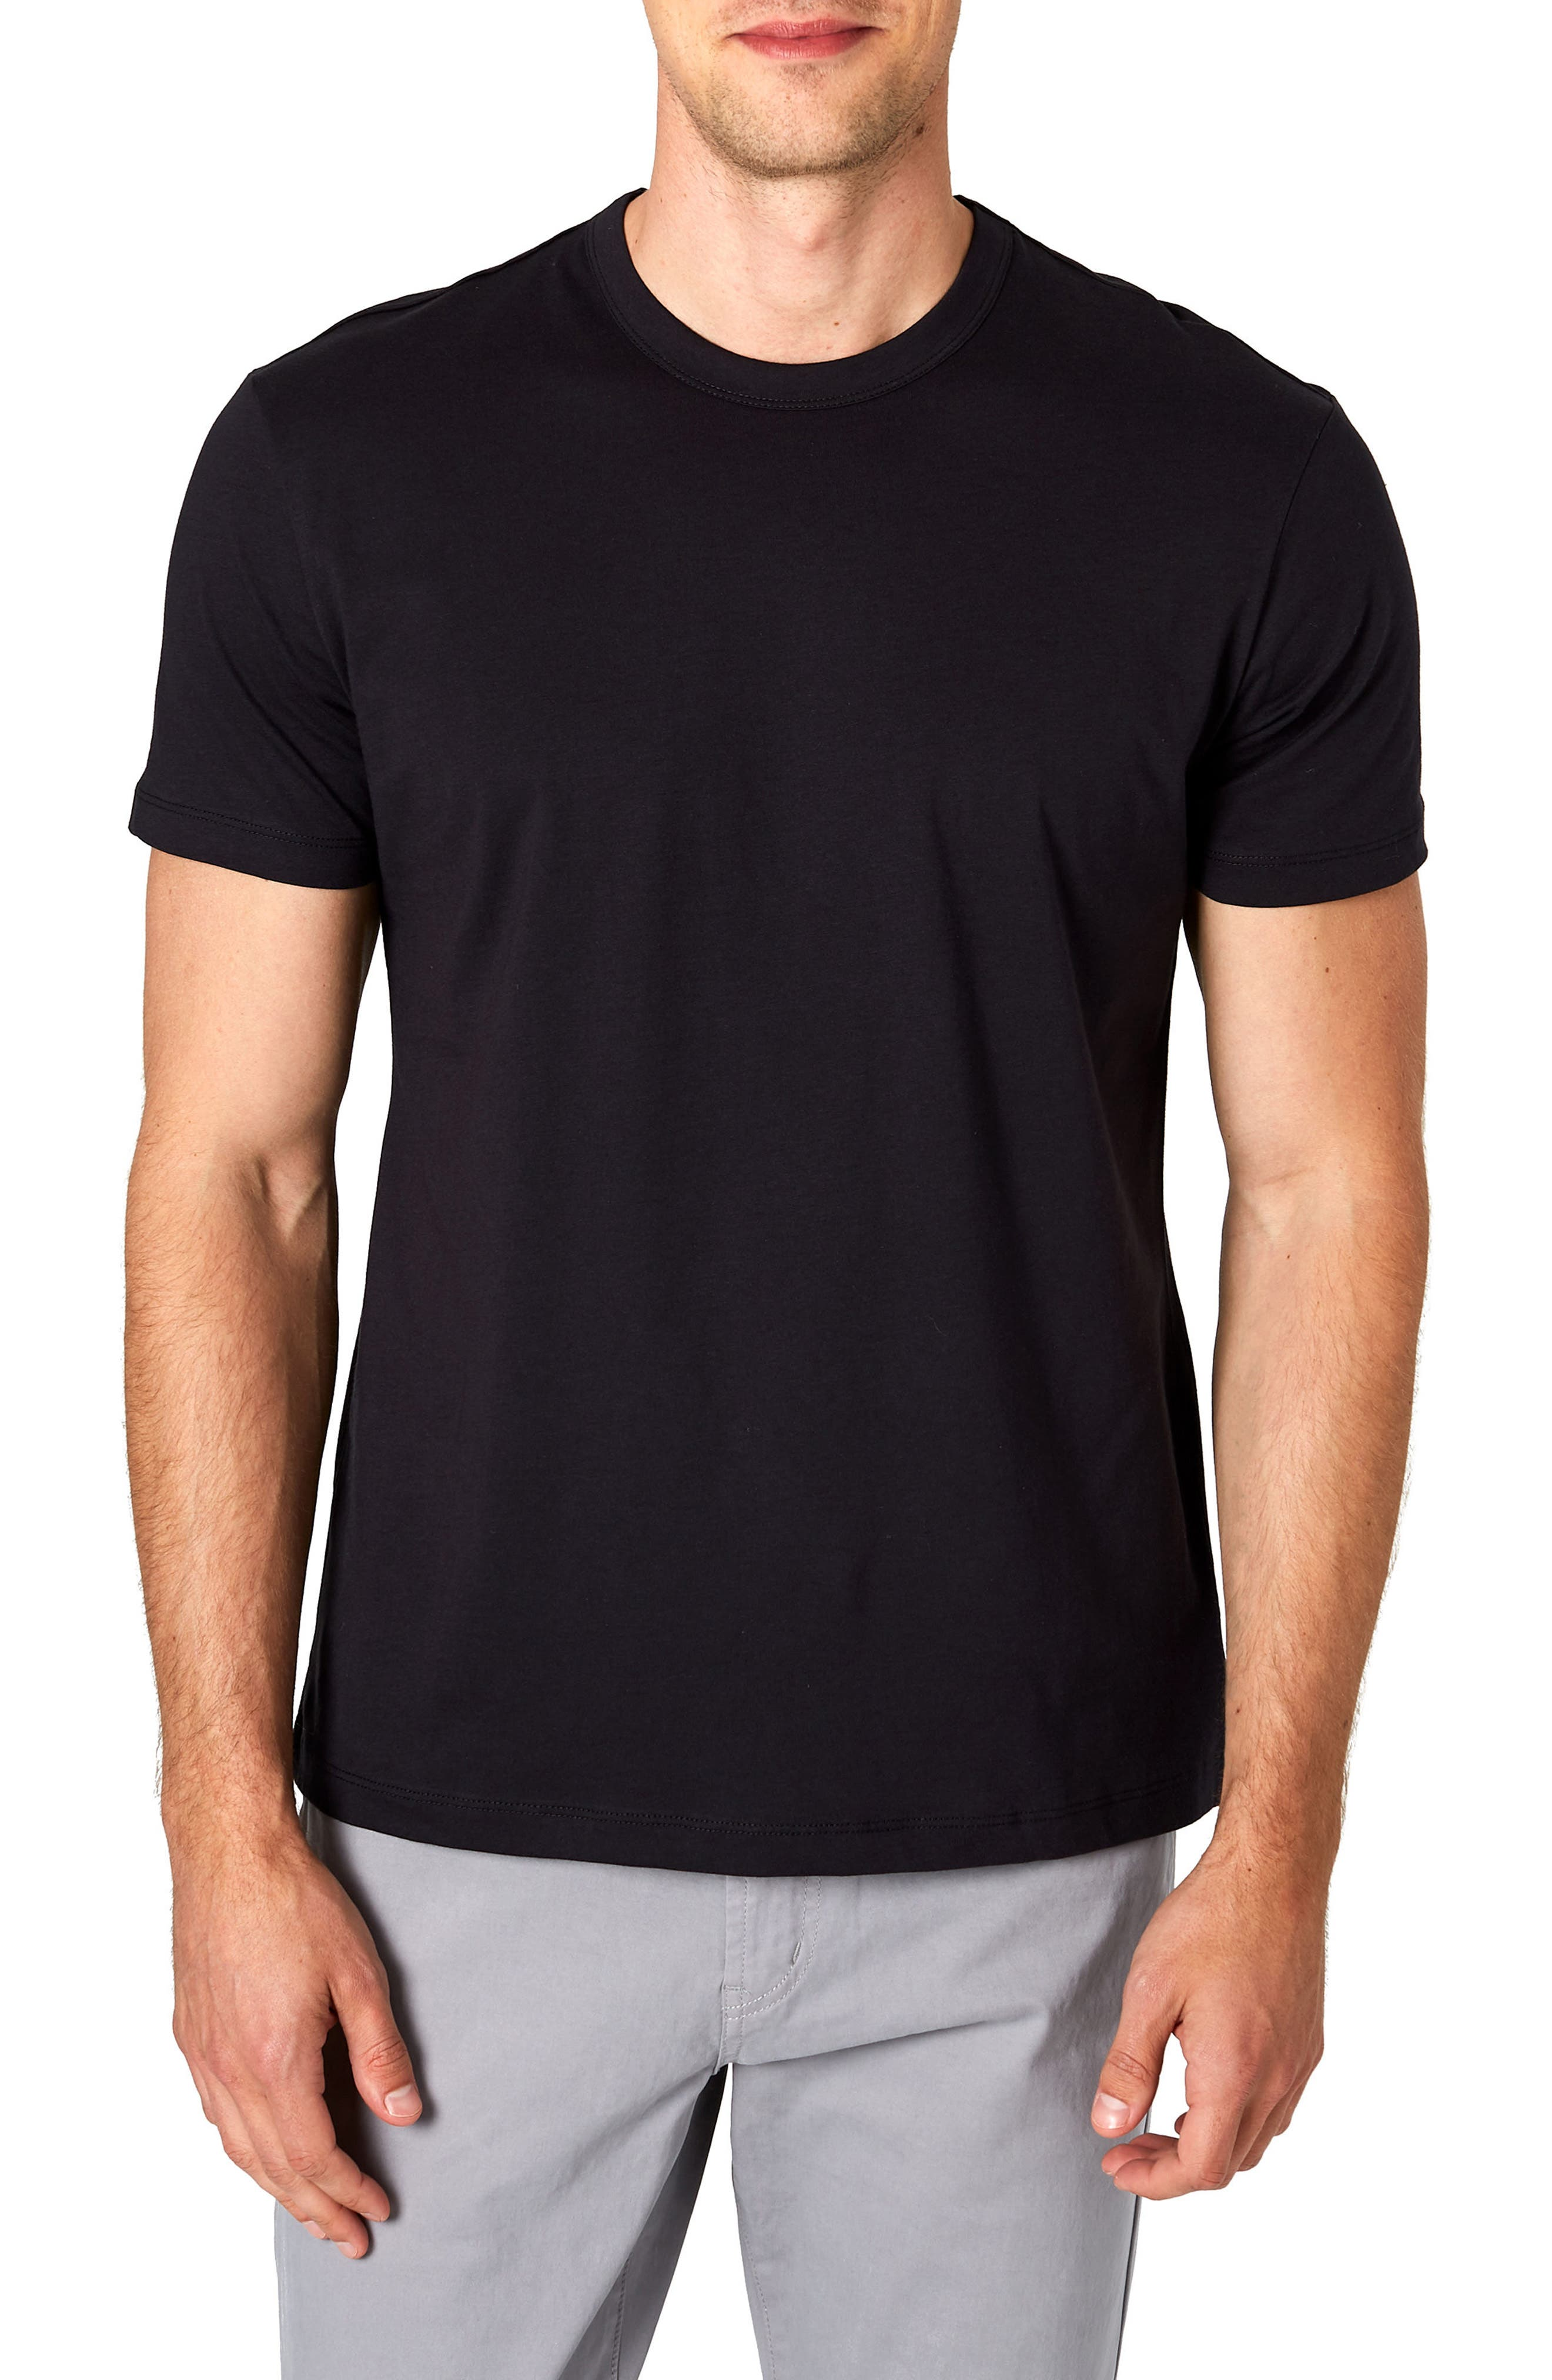 Iqonicq Crewneck T-Shirt,                         Main,                         color, BLACK